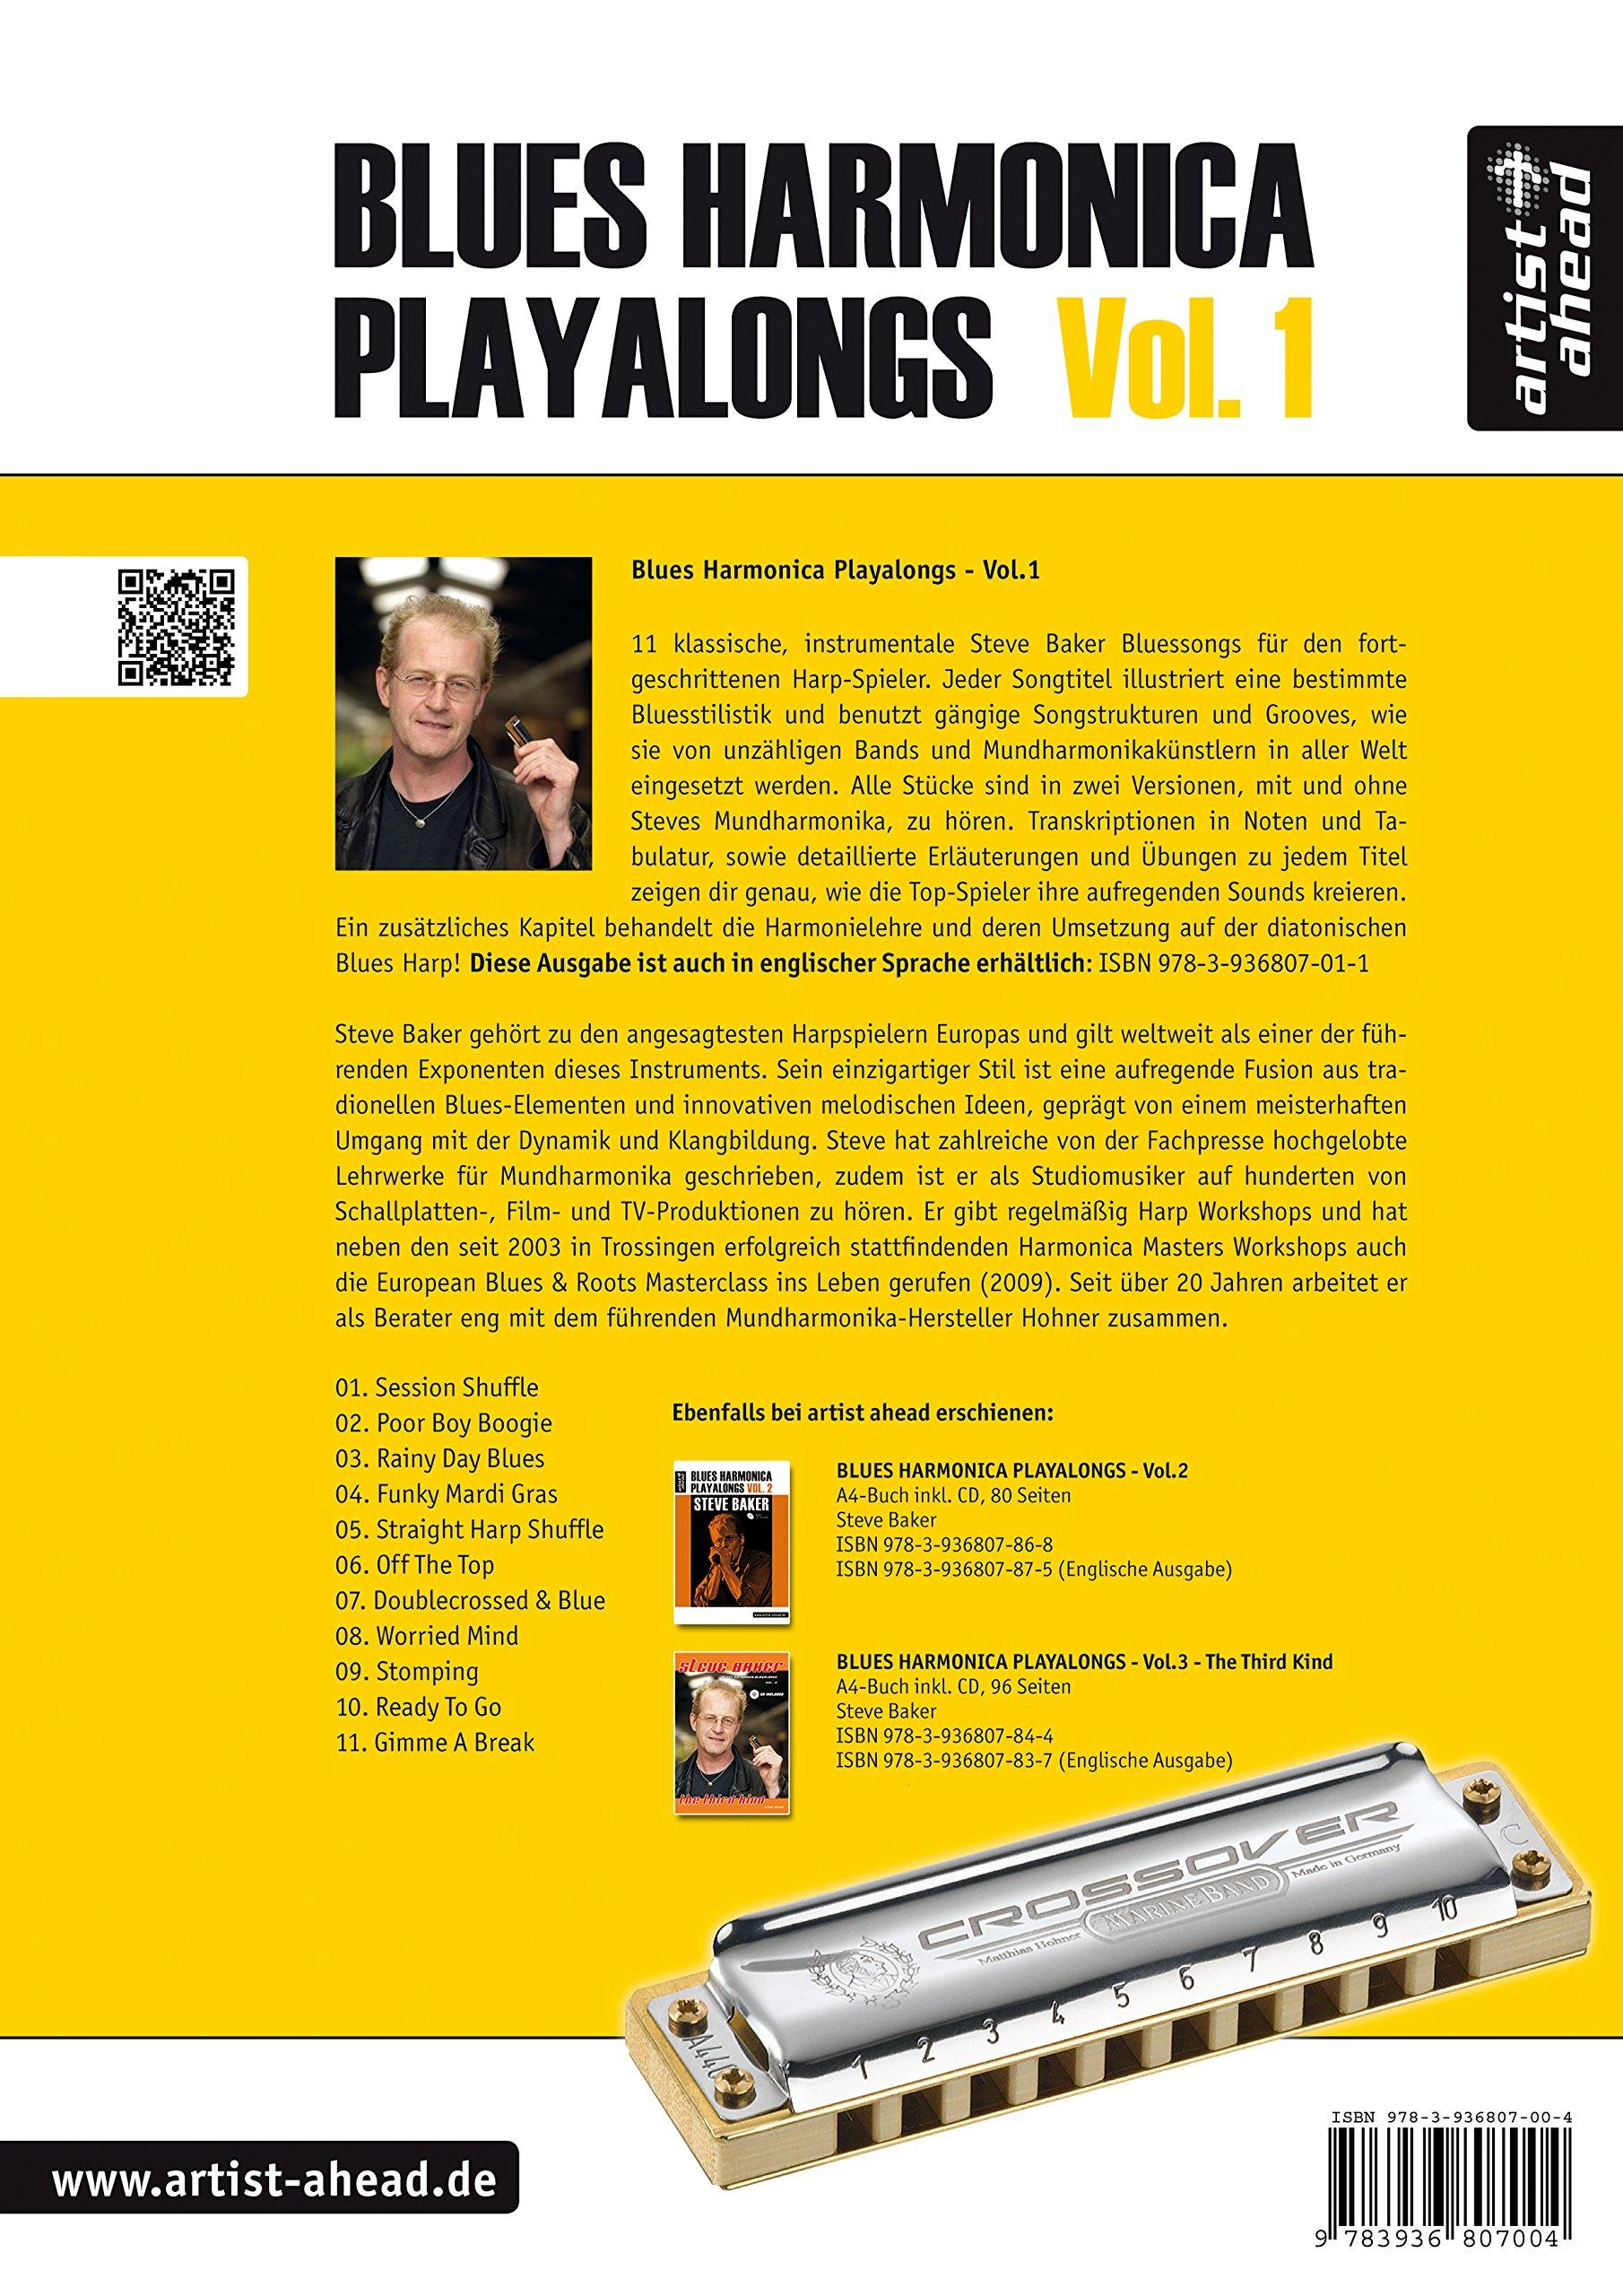 Blues Harmonica Playalongs  Vol  1  Deutsche Ausgabe: Steve Baker